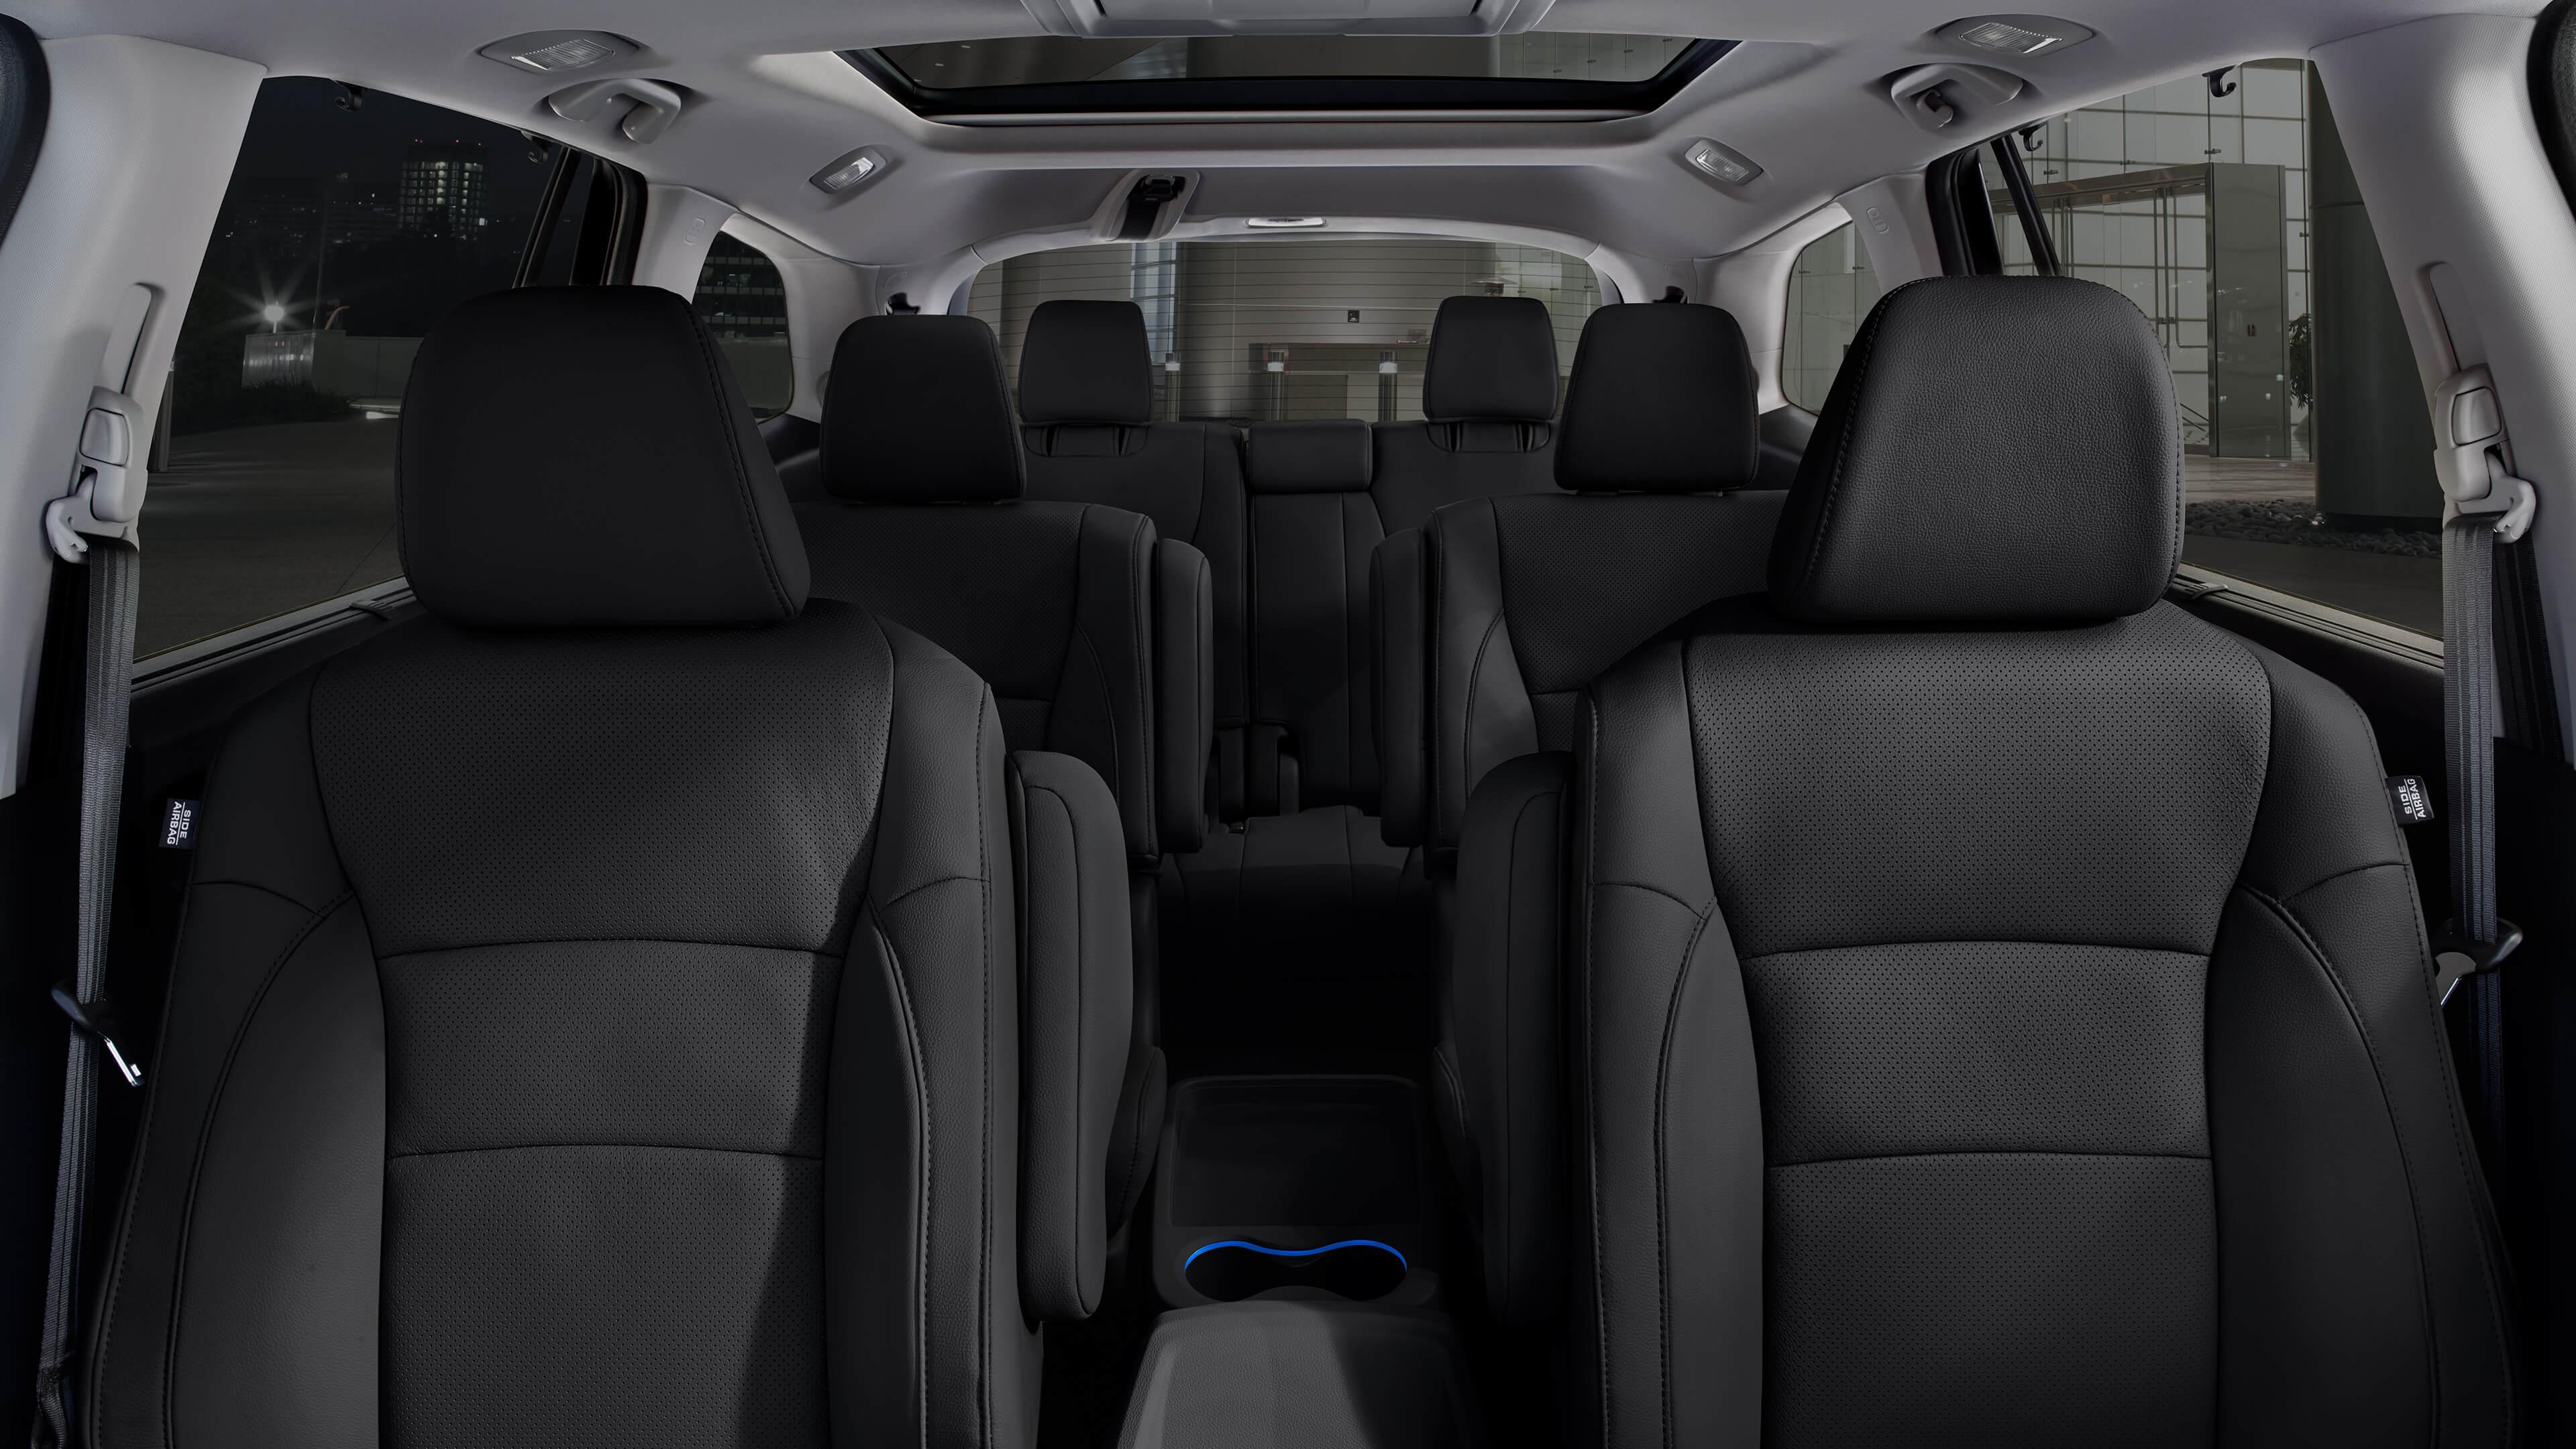 Interior Photo Gallery The 2021 Pilot Honda Canada